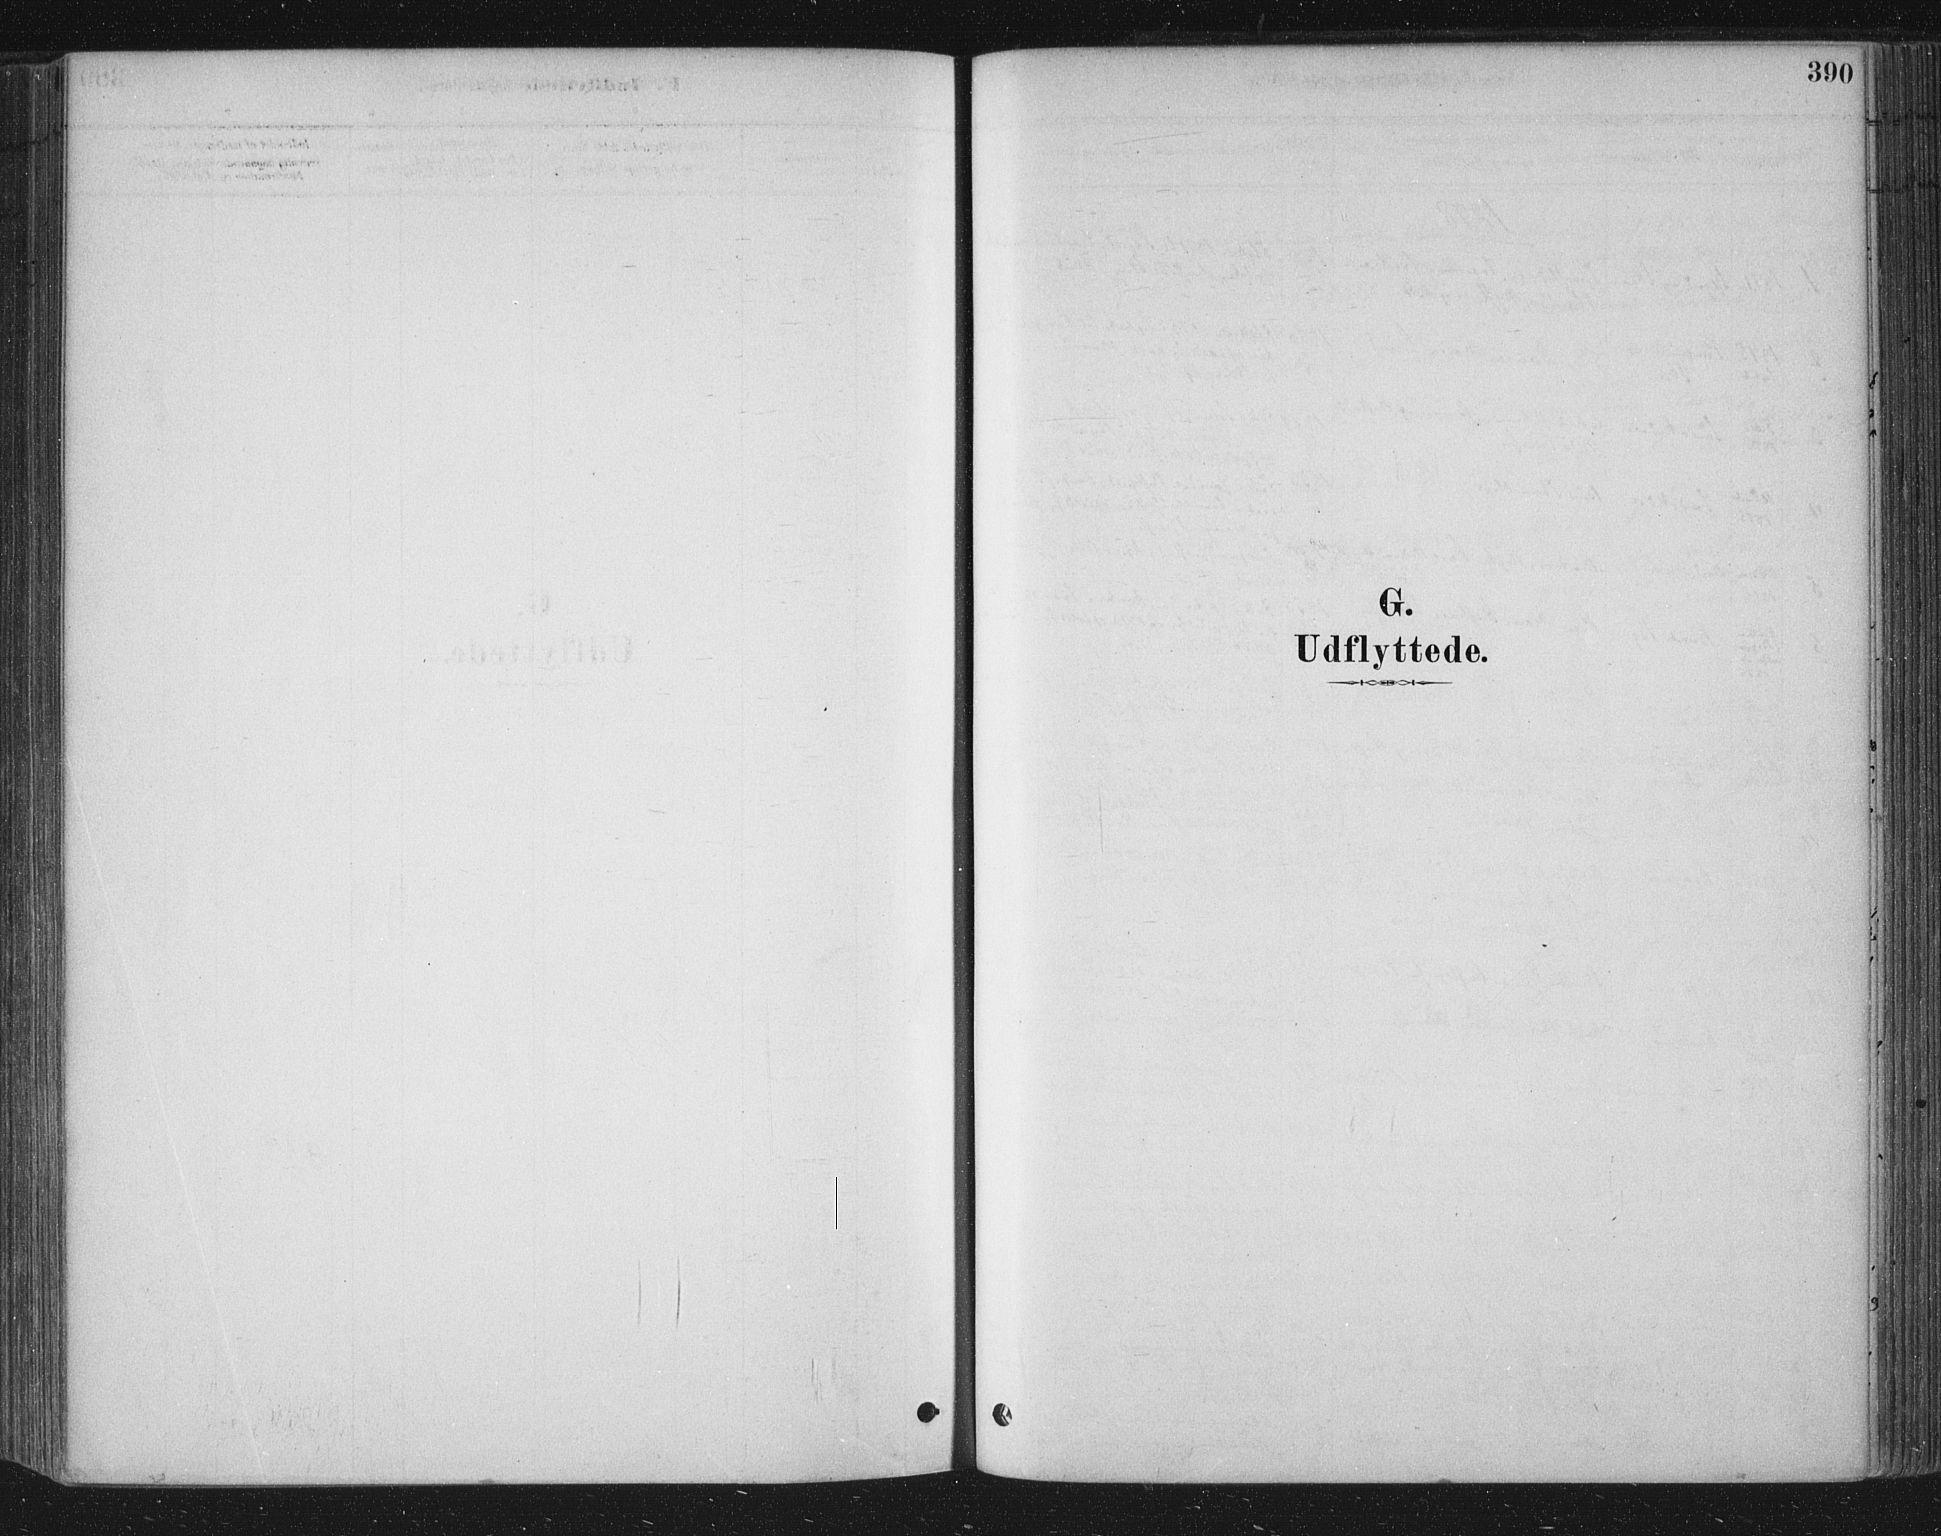 SAKO, Bamble kirkebøker, F/Fa/L0007: Ministerialbok nr. I 7, 1878-1888, s. 390